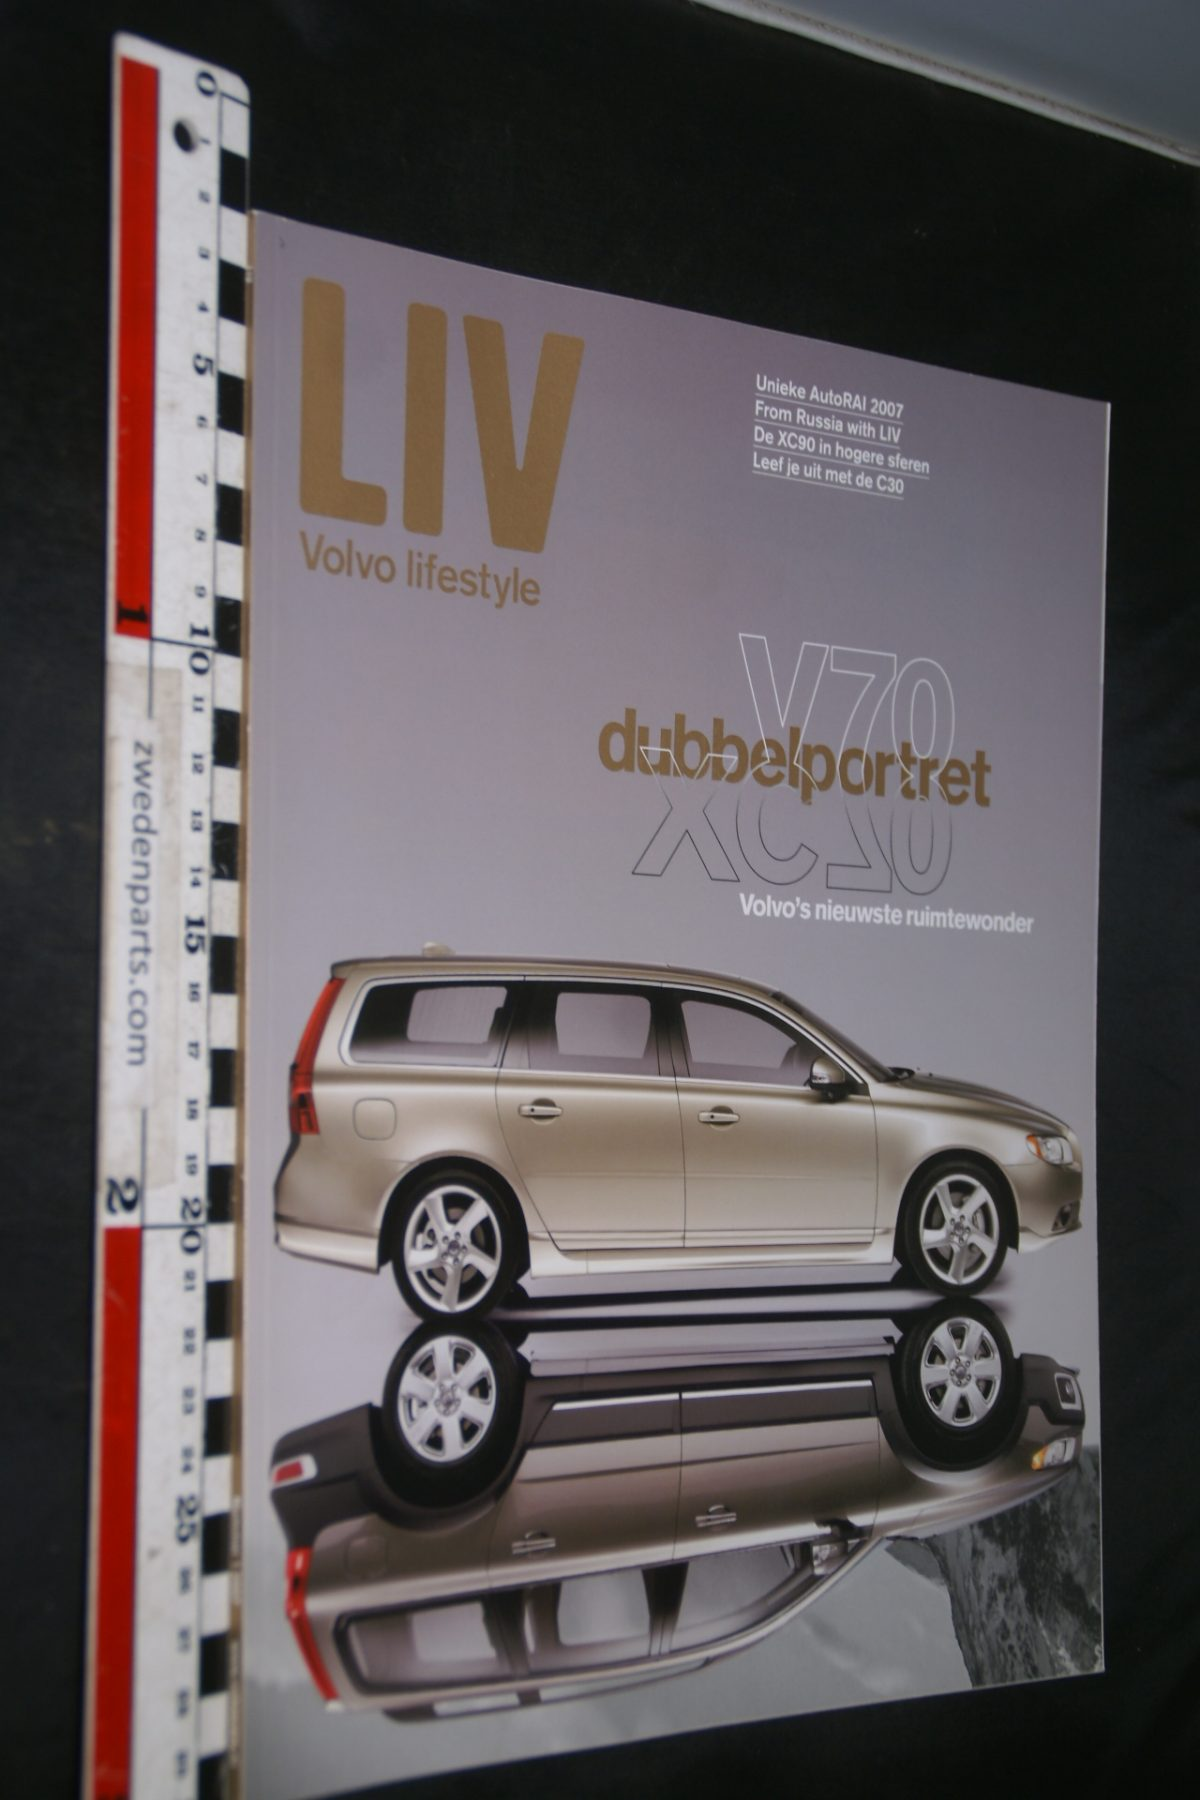 DSC04219  tijdschrift Volvo LIV V70 XC70